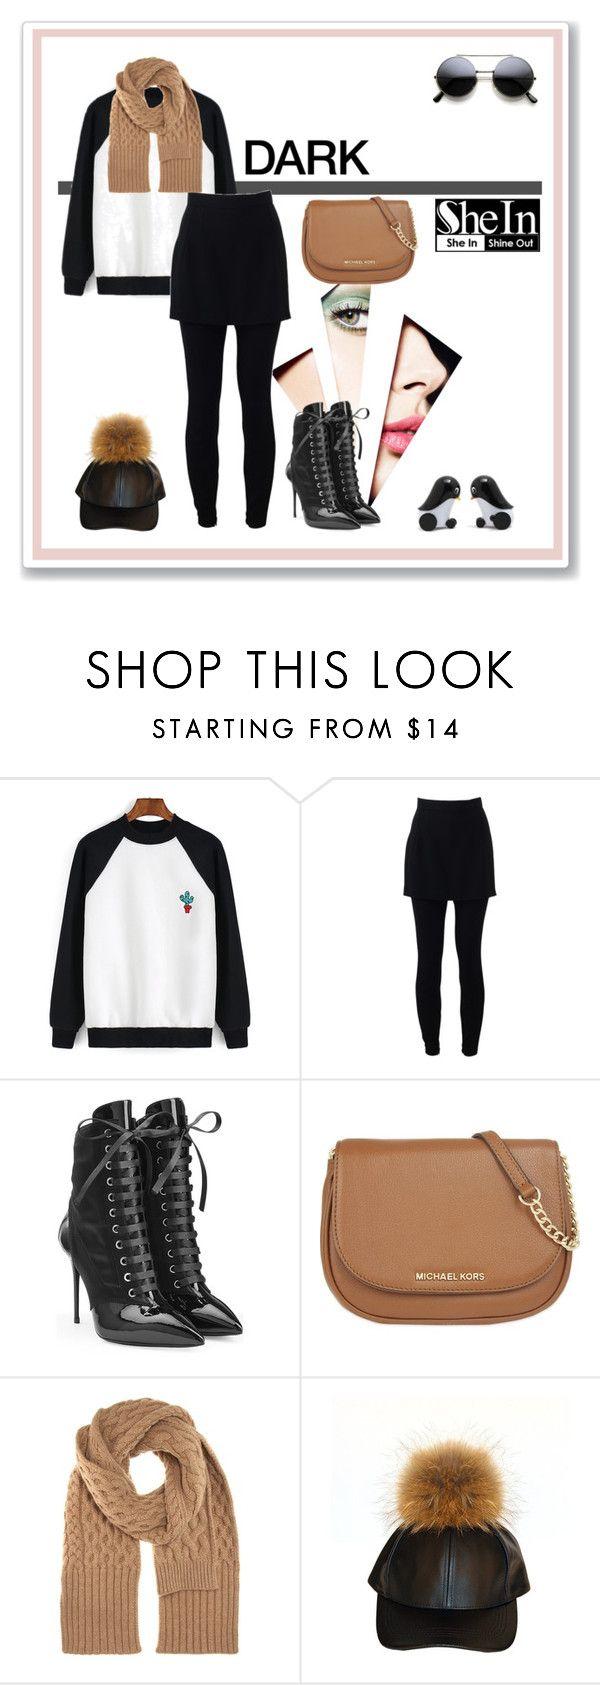 """Contrasts"" by ul-inn ❤ liked on Polyvore featuring Dolce&Gabbana, Giuseppe Zanotti, MICHAEL Michael Kors, Maison Margiela, women's clothing, women's fashion, women, female, woman and misses"